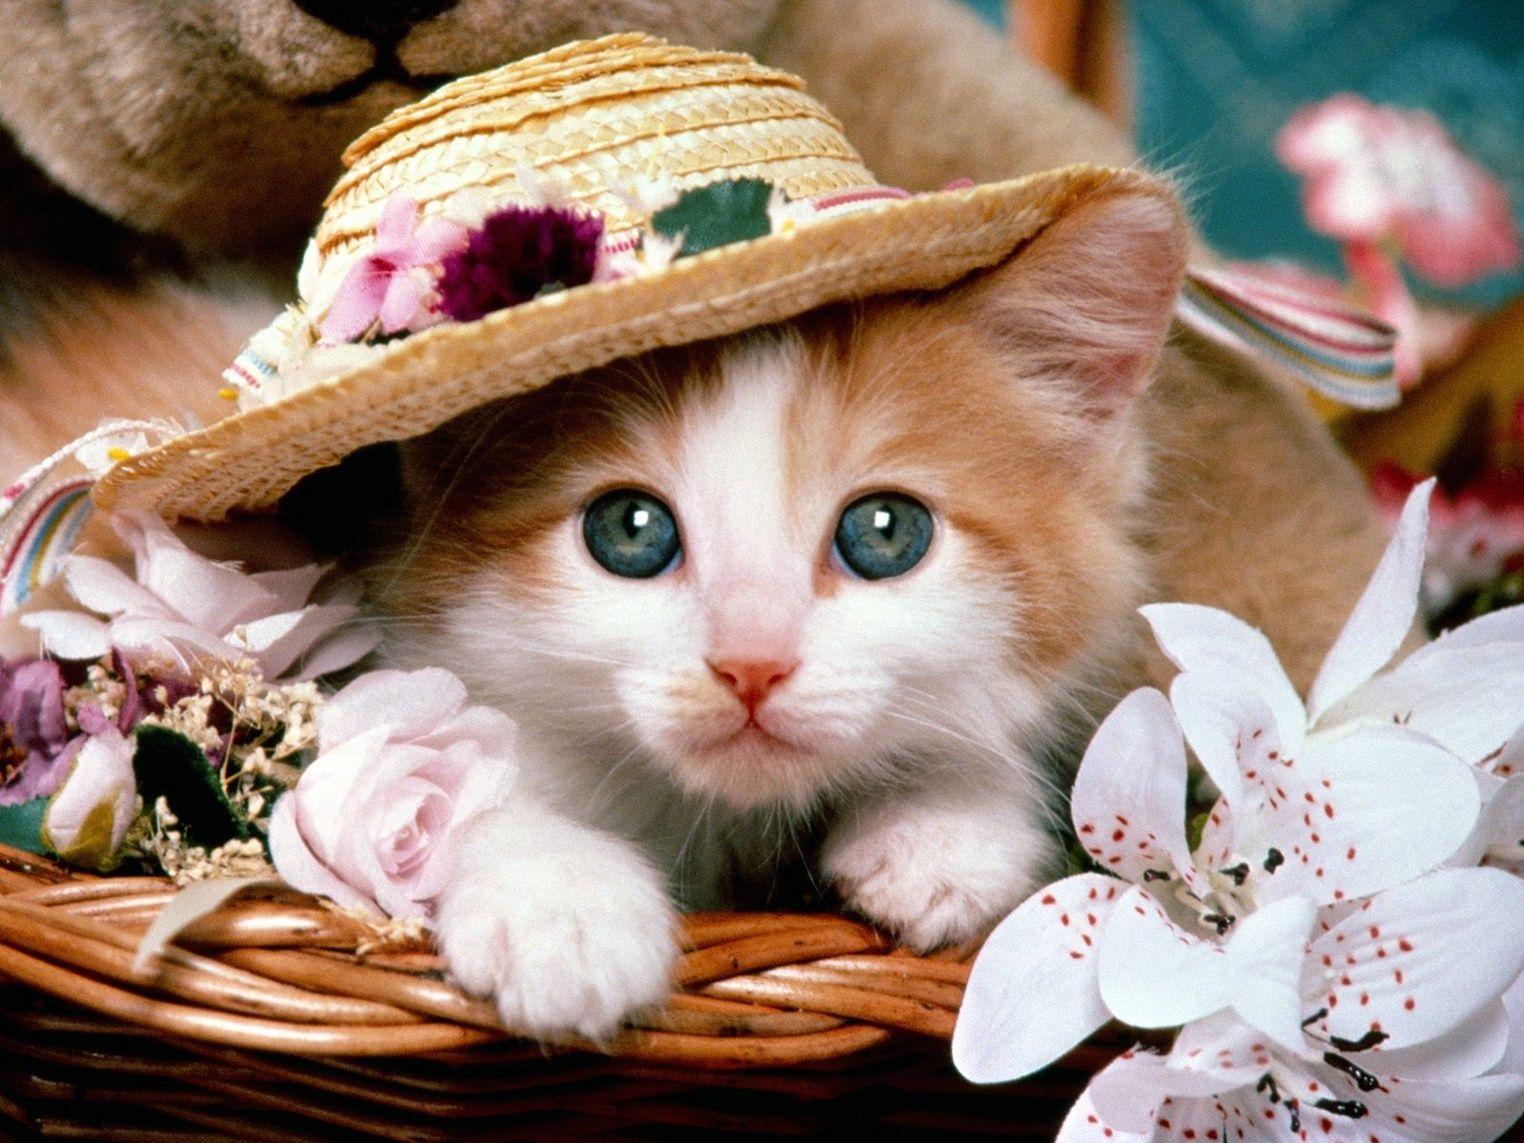 Wallpaper download cat - Baby Cat Wallpaper